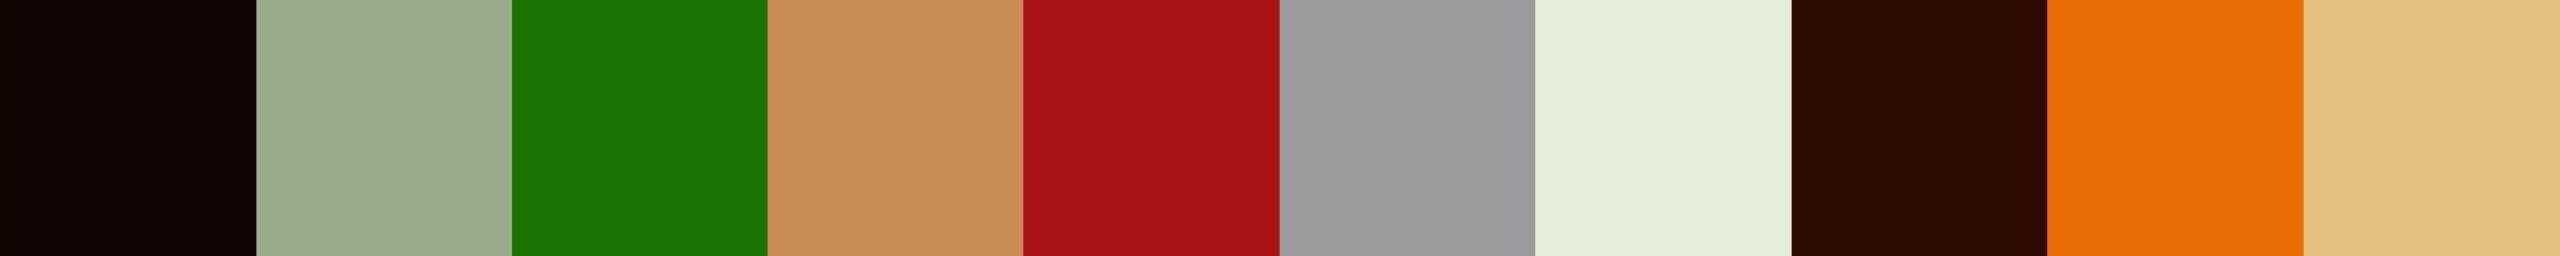 143 Hadiria Color Palette